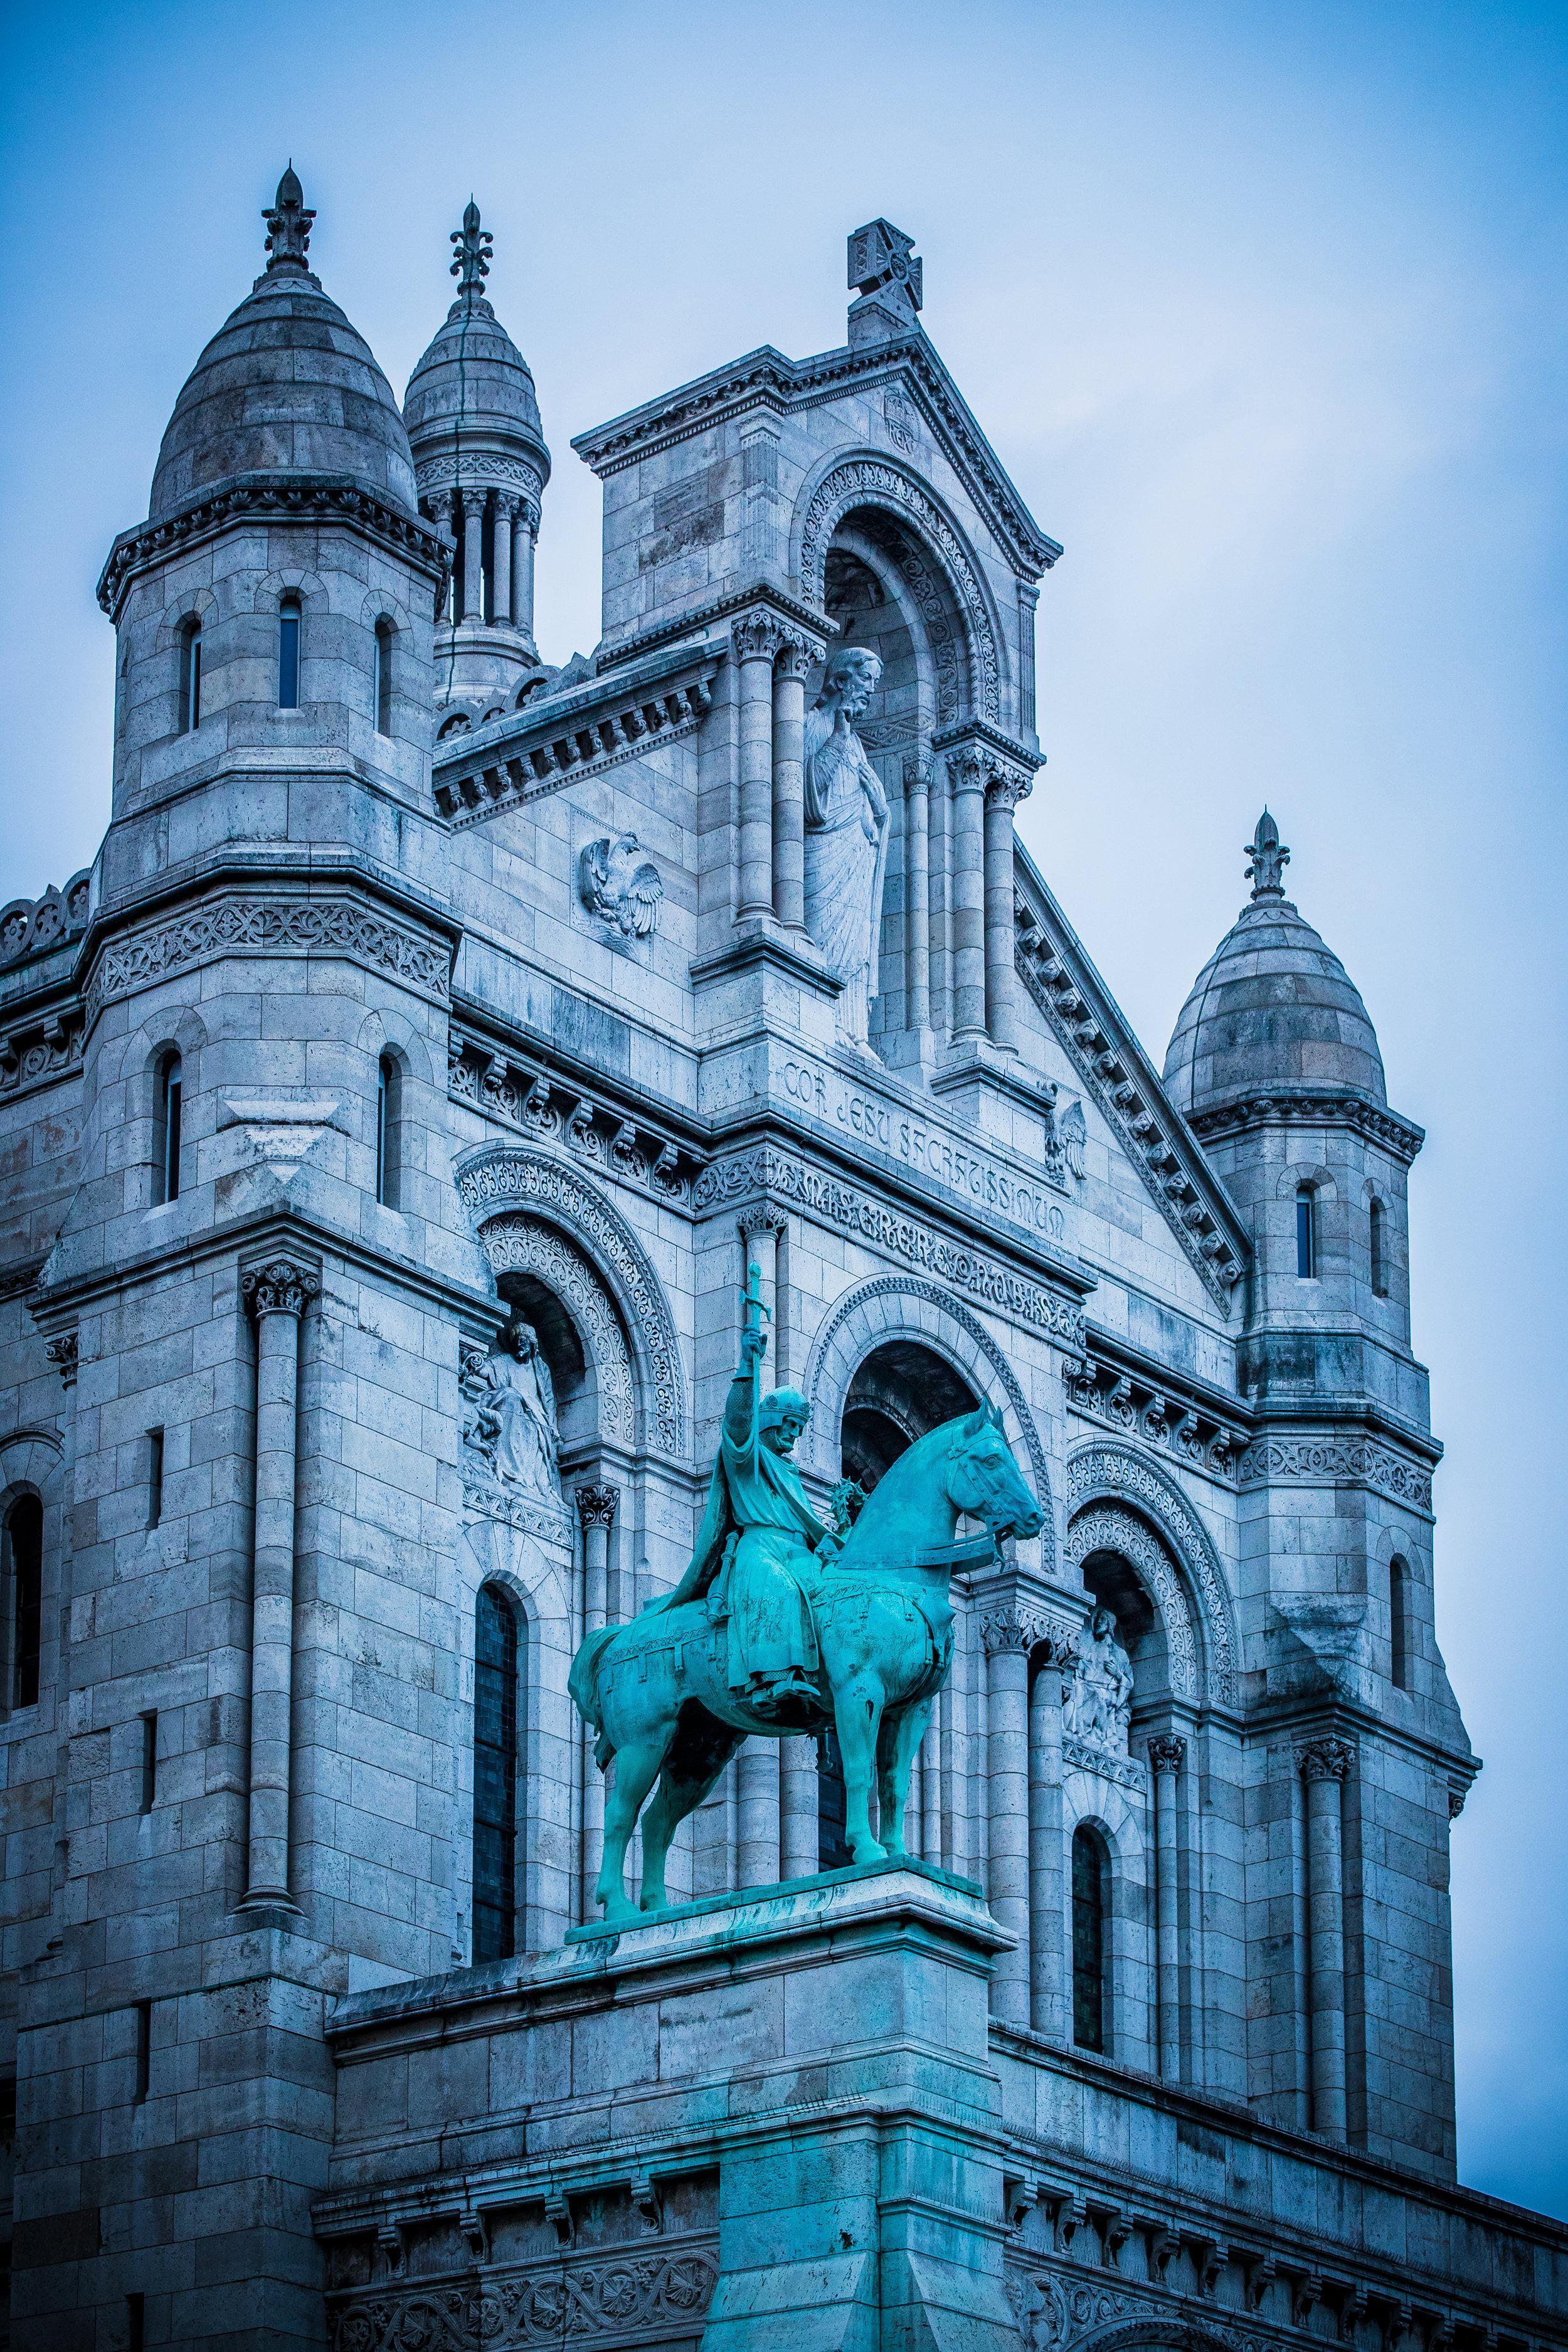 Sacre-Coeur:  http://www.sacre-coeur-montmartre.com/english/